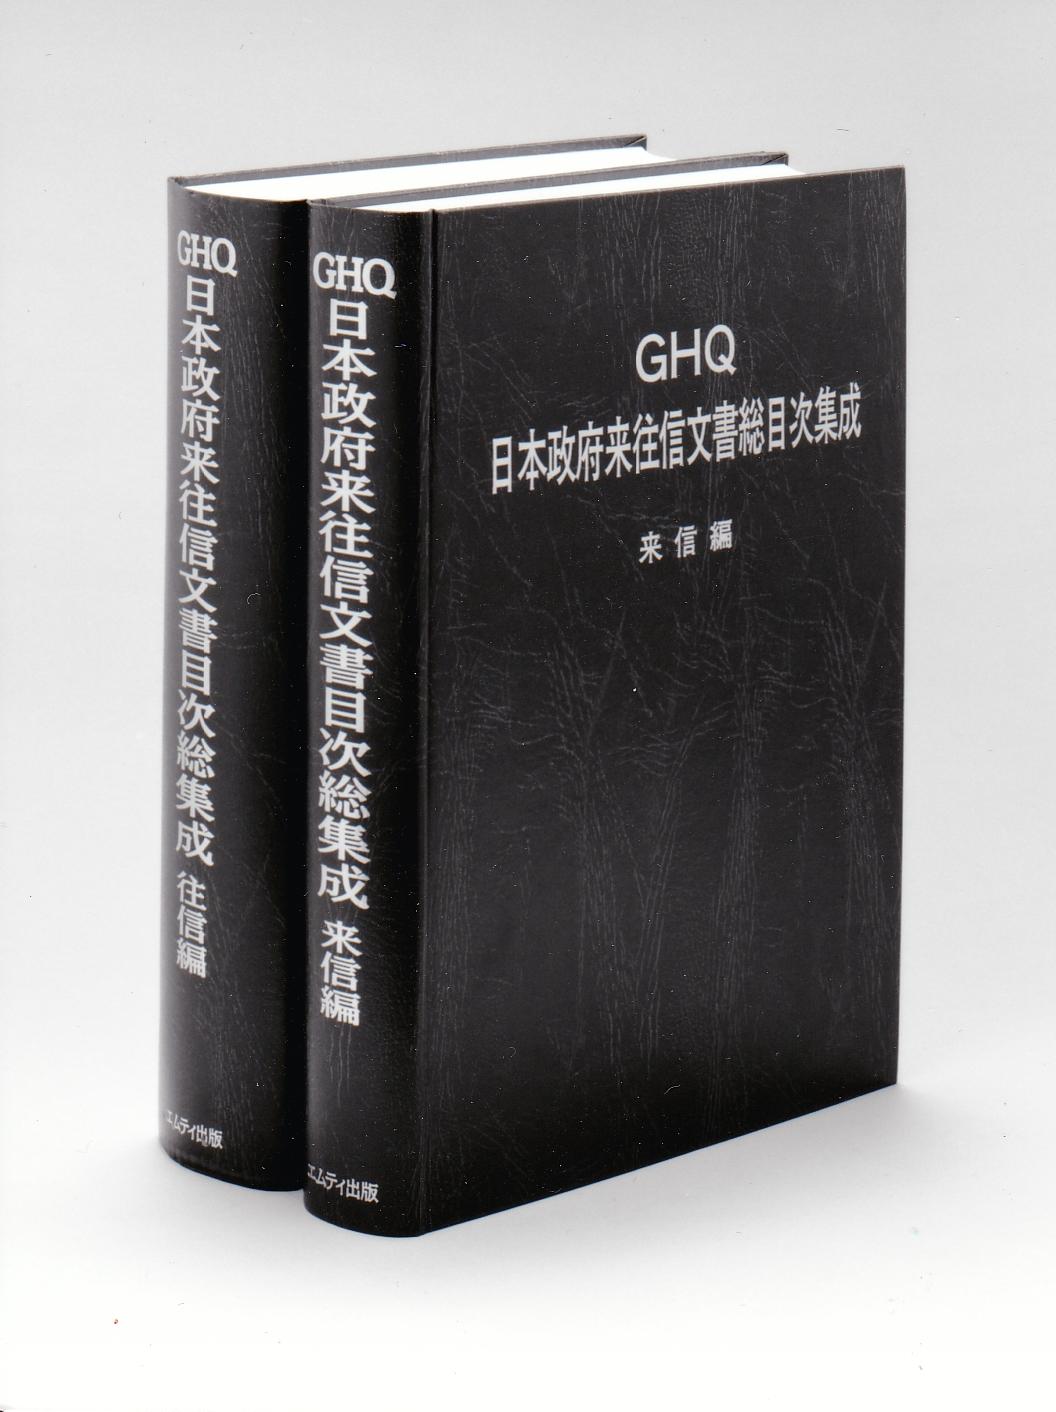 GHQ日本政府来往信目次総集成